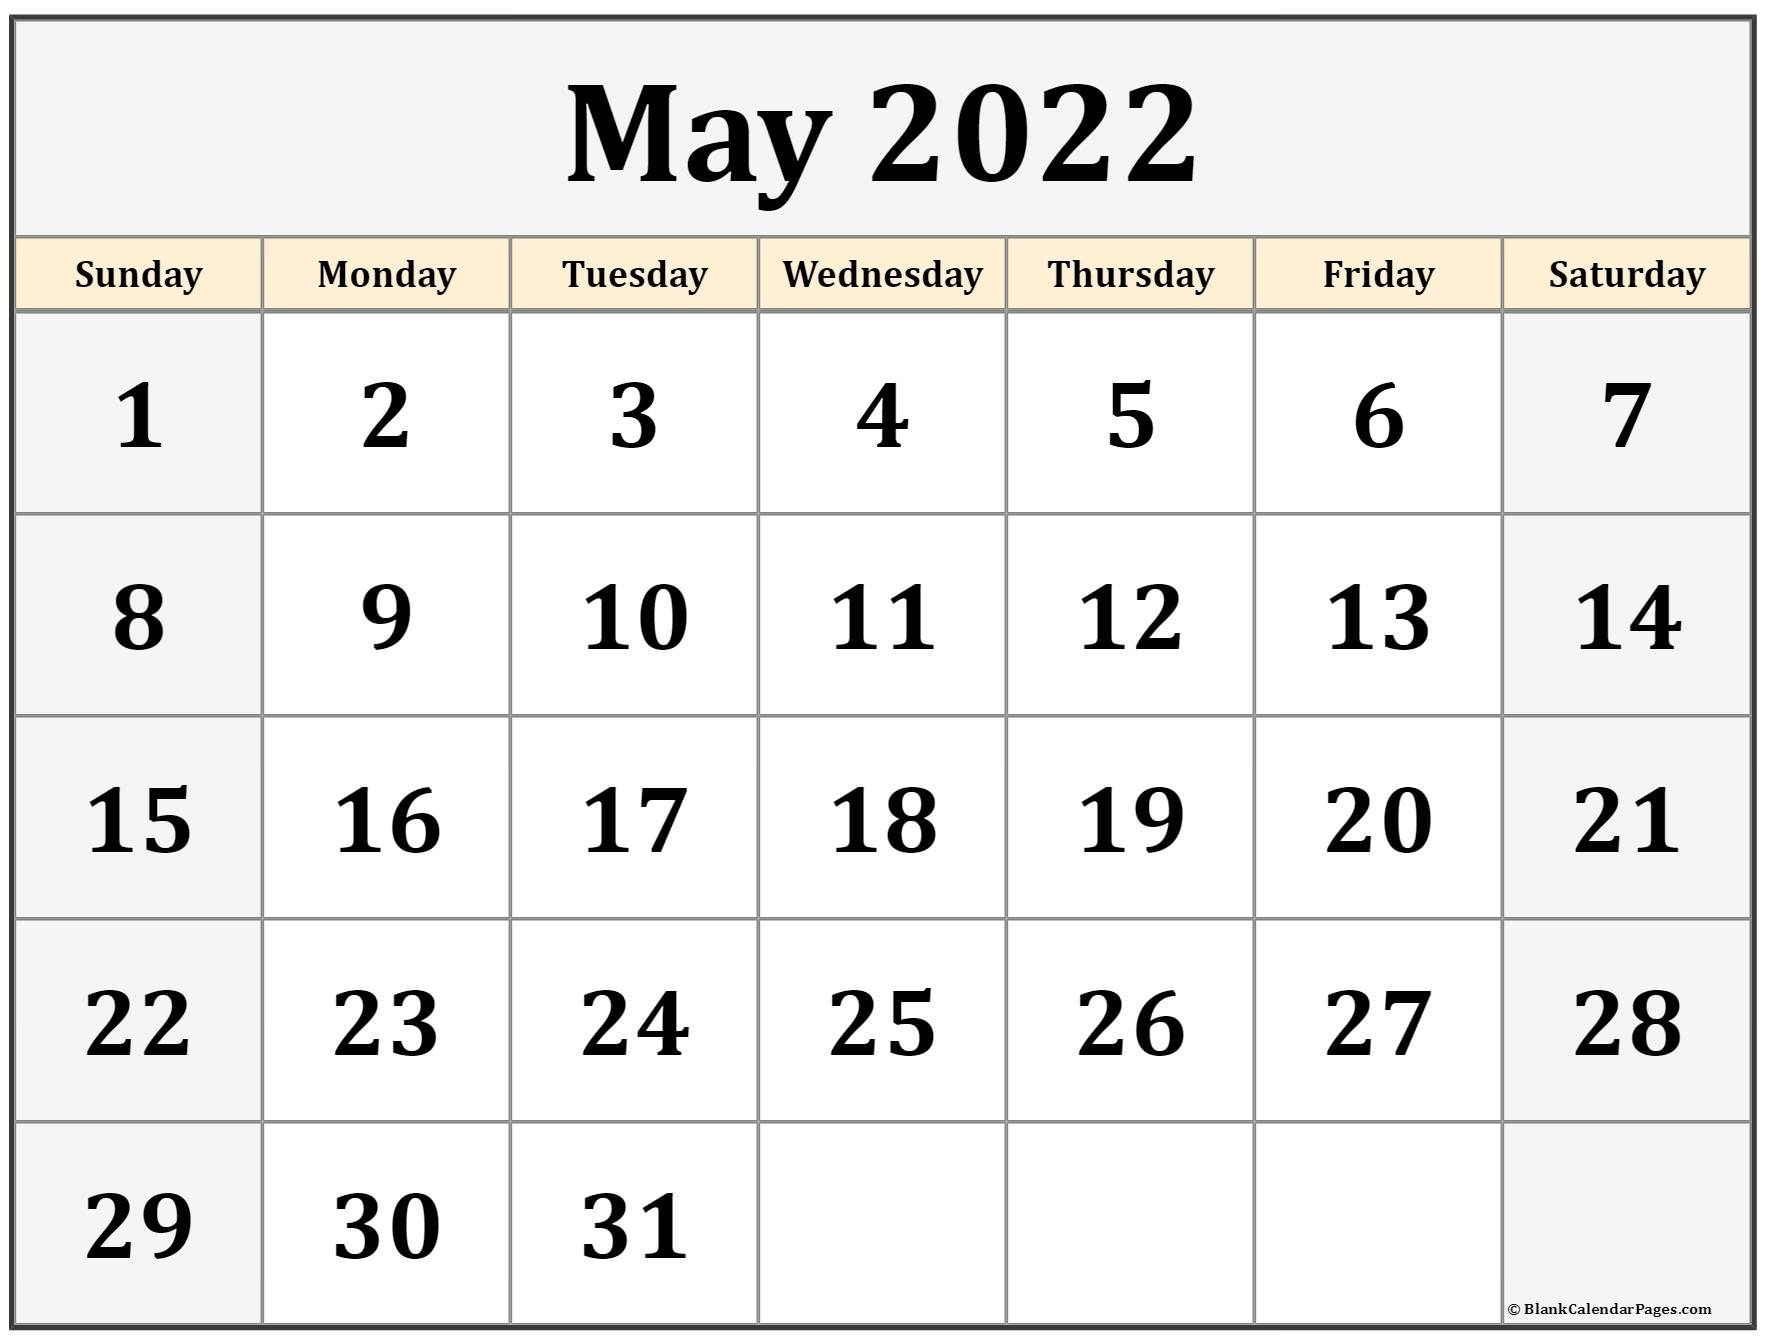 May 2022 Calendar Printable   Free Printable Calendar Monthly in Printable Mayl 2022 Calendar Image